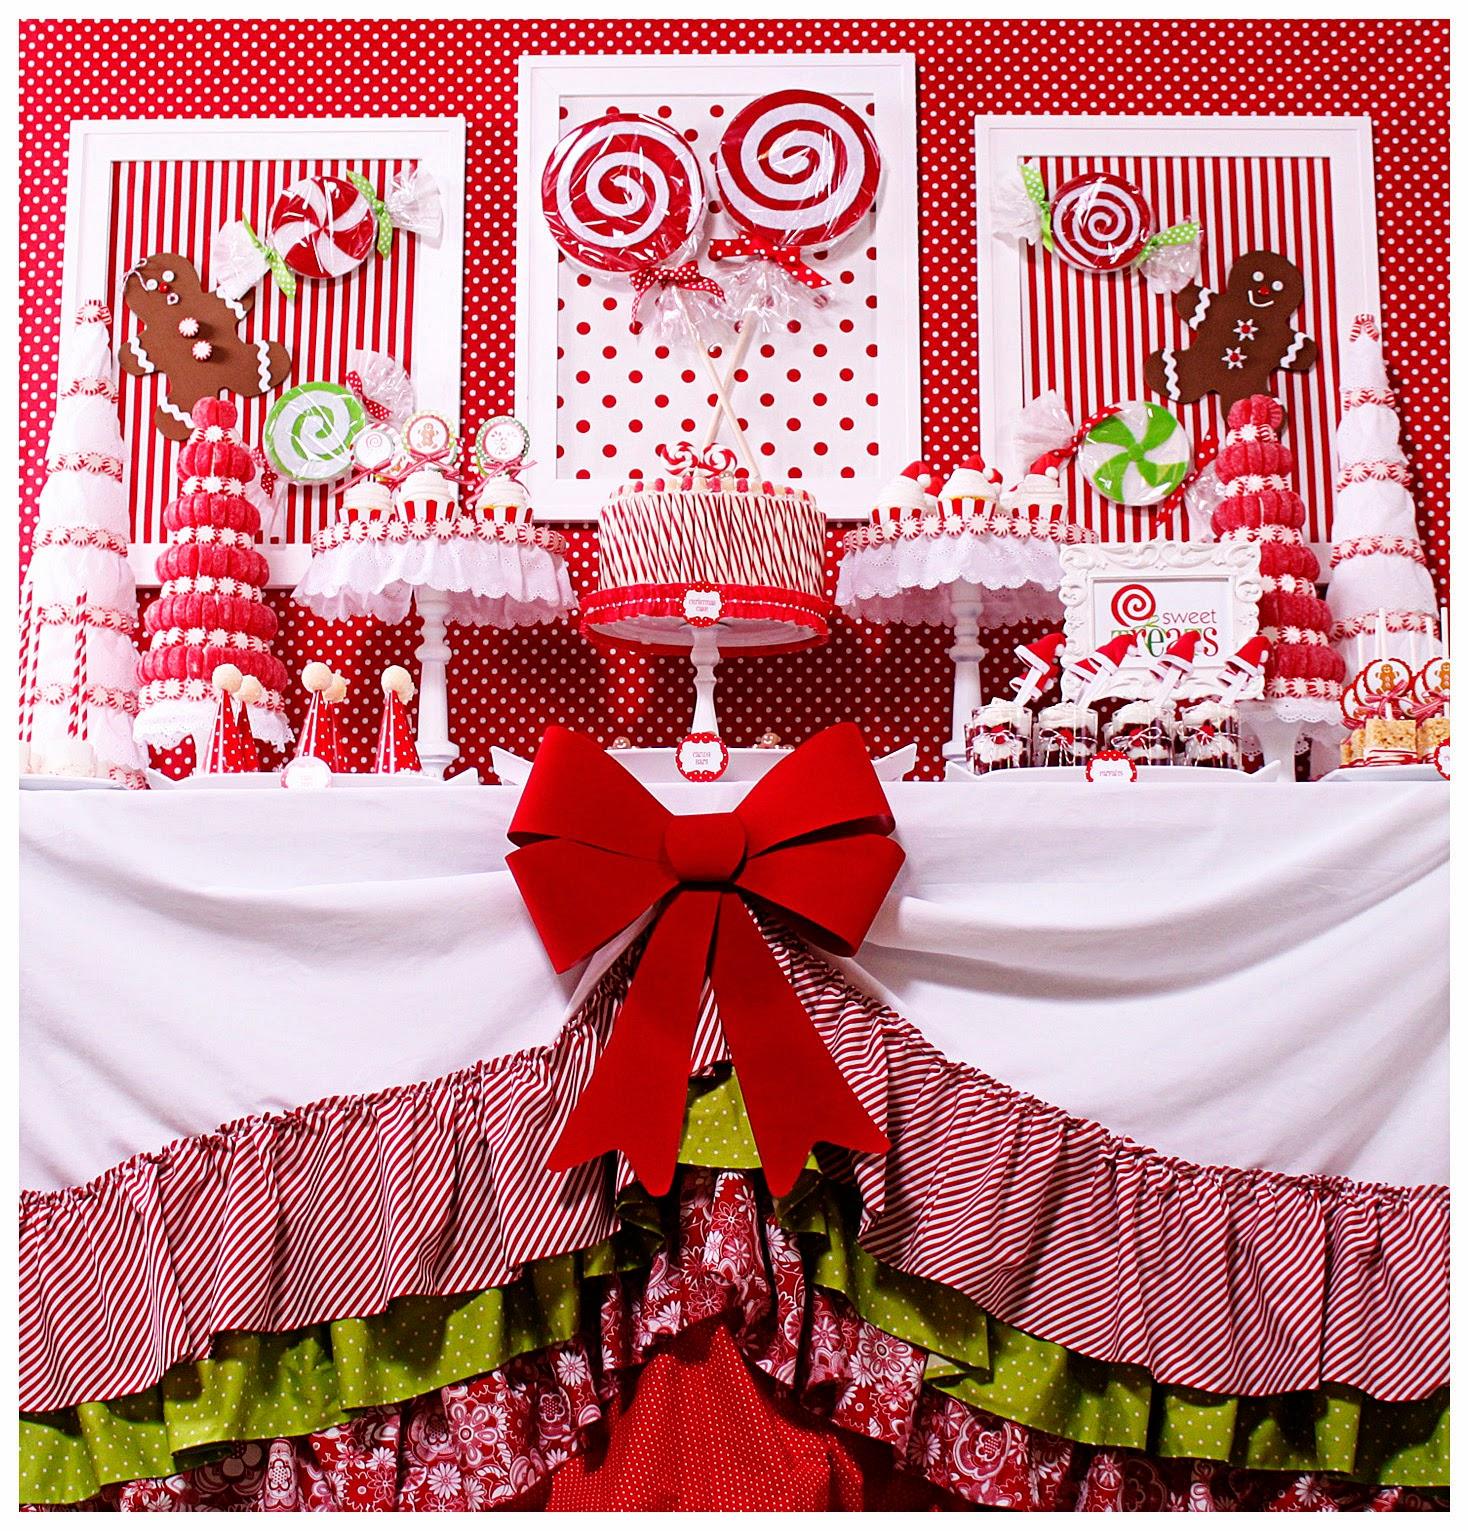 http://4.bp.blogspot.com/-X3dQU0uyUoE/VH2obiuBjCI/AAAAAAAAM9E/l3xGUOegQVA/s1600/christmas%2Bparty%2Bprintable15.jpg